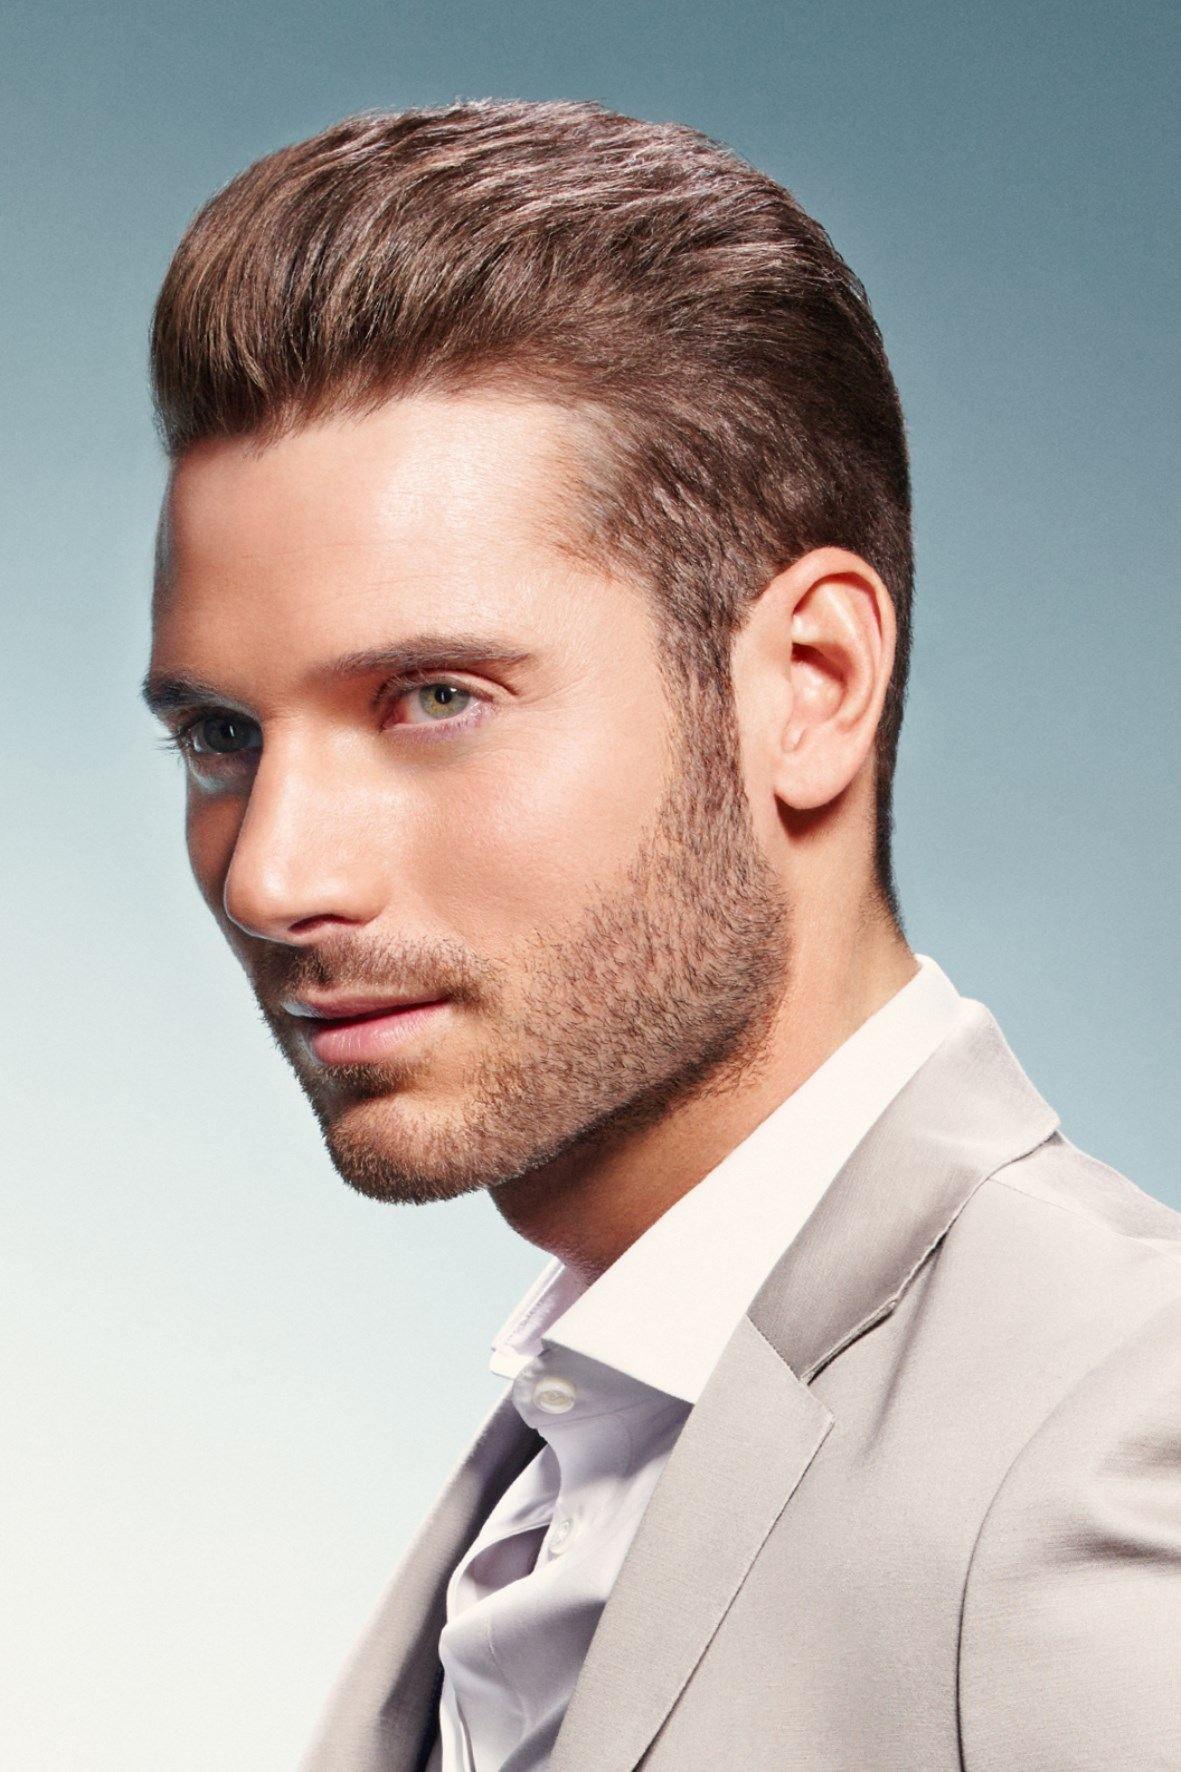 0fb7944d9cf1 Coiffure homme automne 2016 - http   tendances-coiffure.ru coiffure